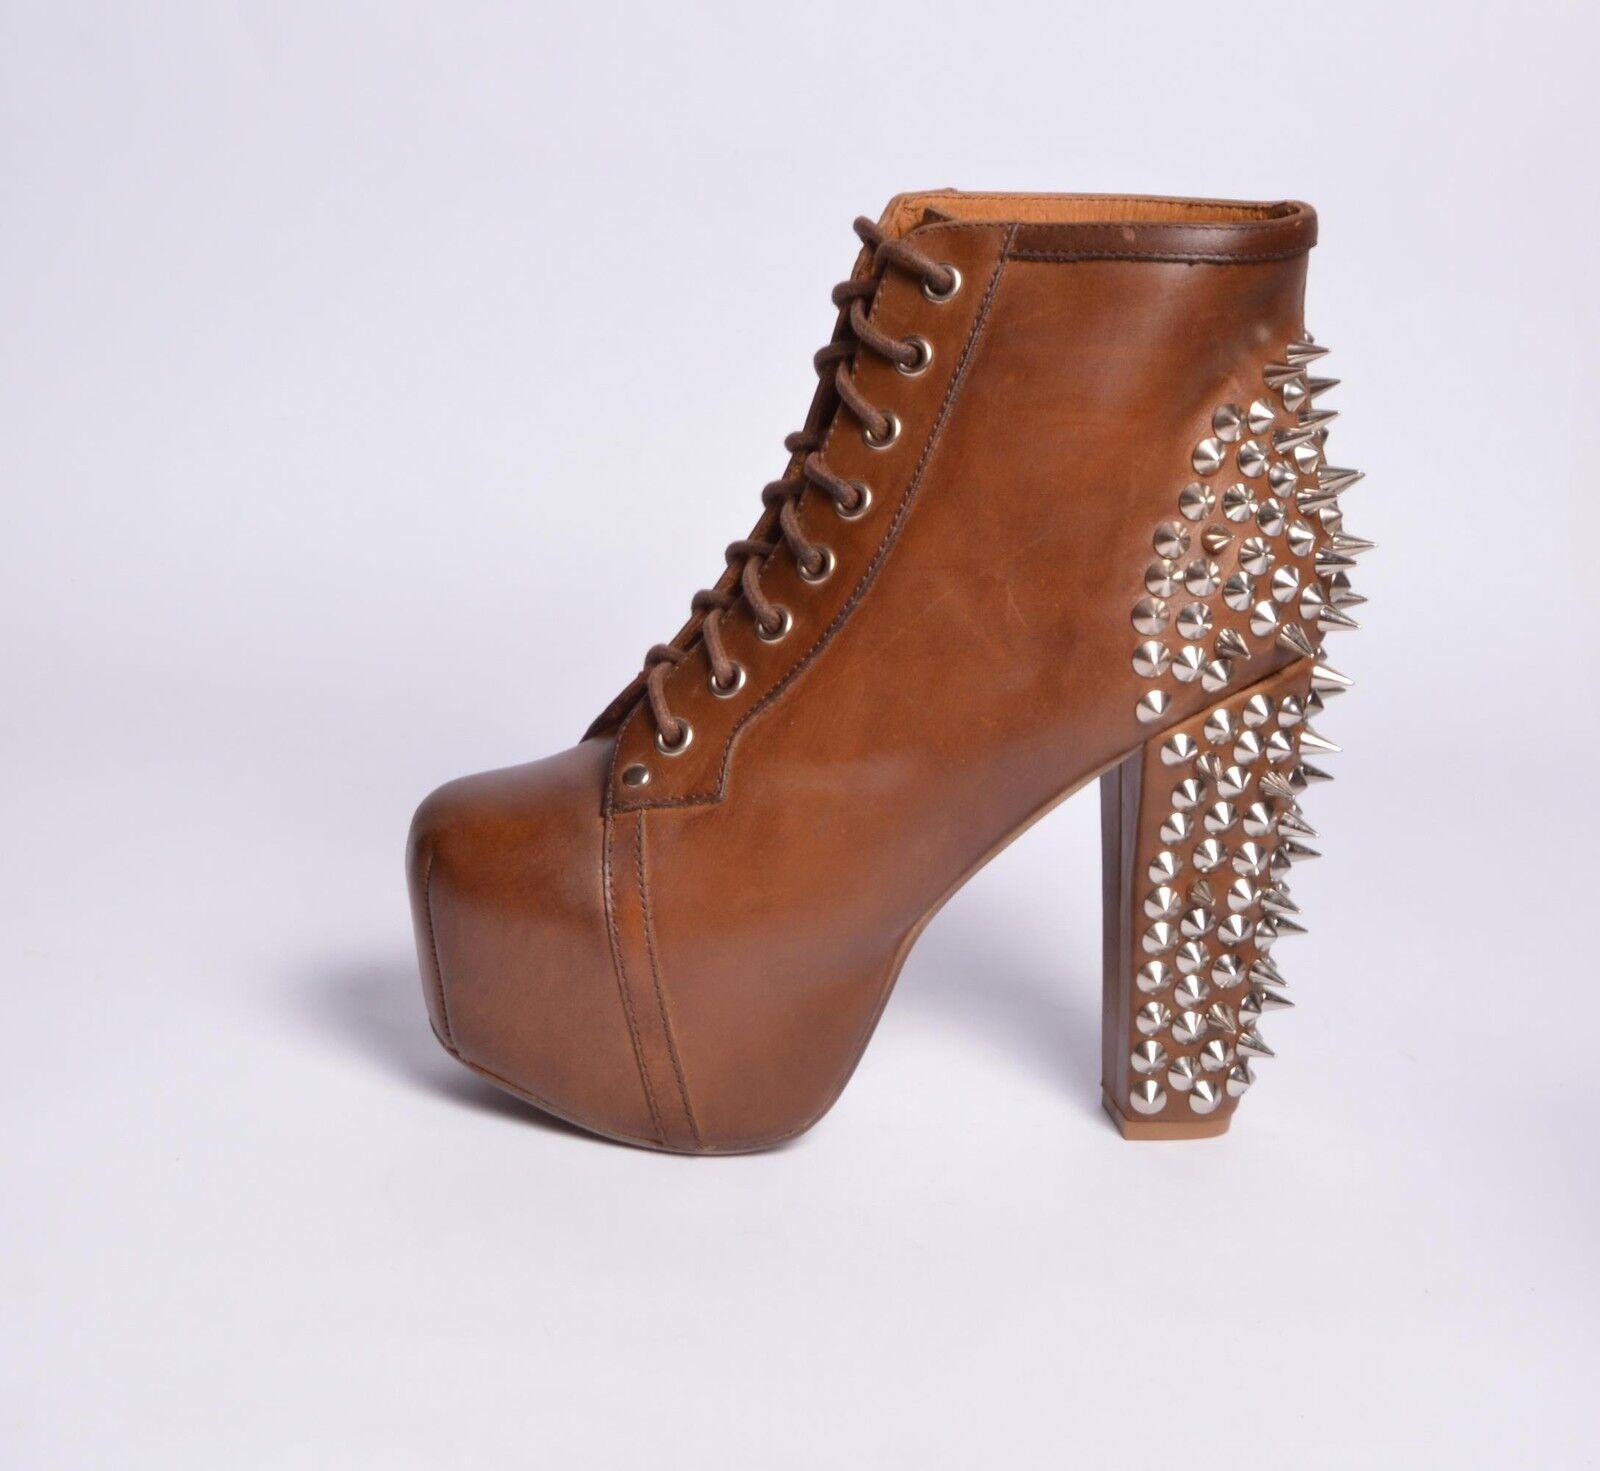 Grandes zapatos con descuento JEFFREY CAMPBELL SCARPE DONNA LITA SPIKE LEATHER DARK BROWN